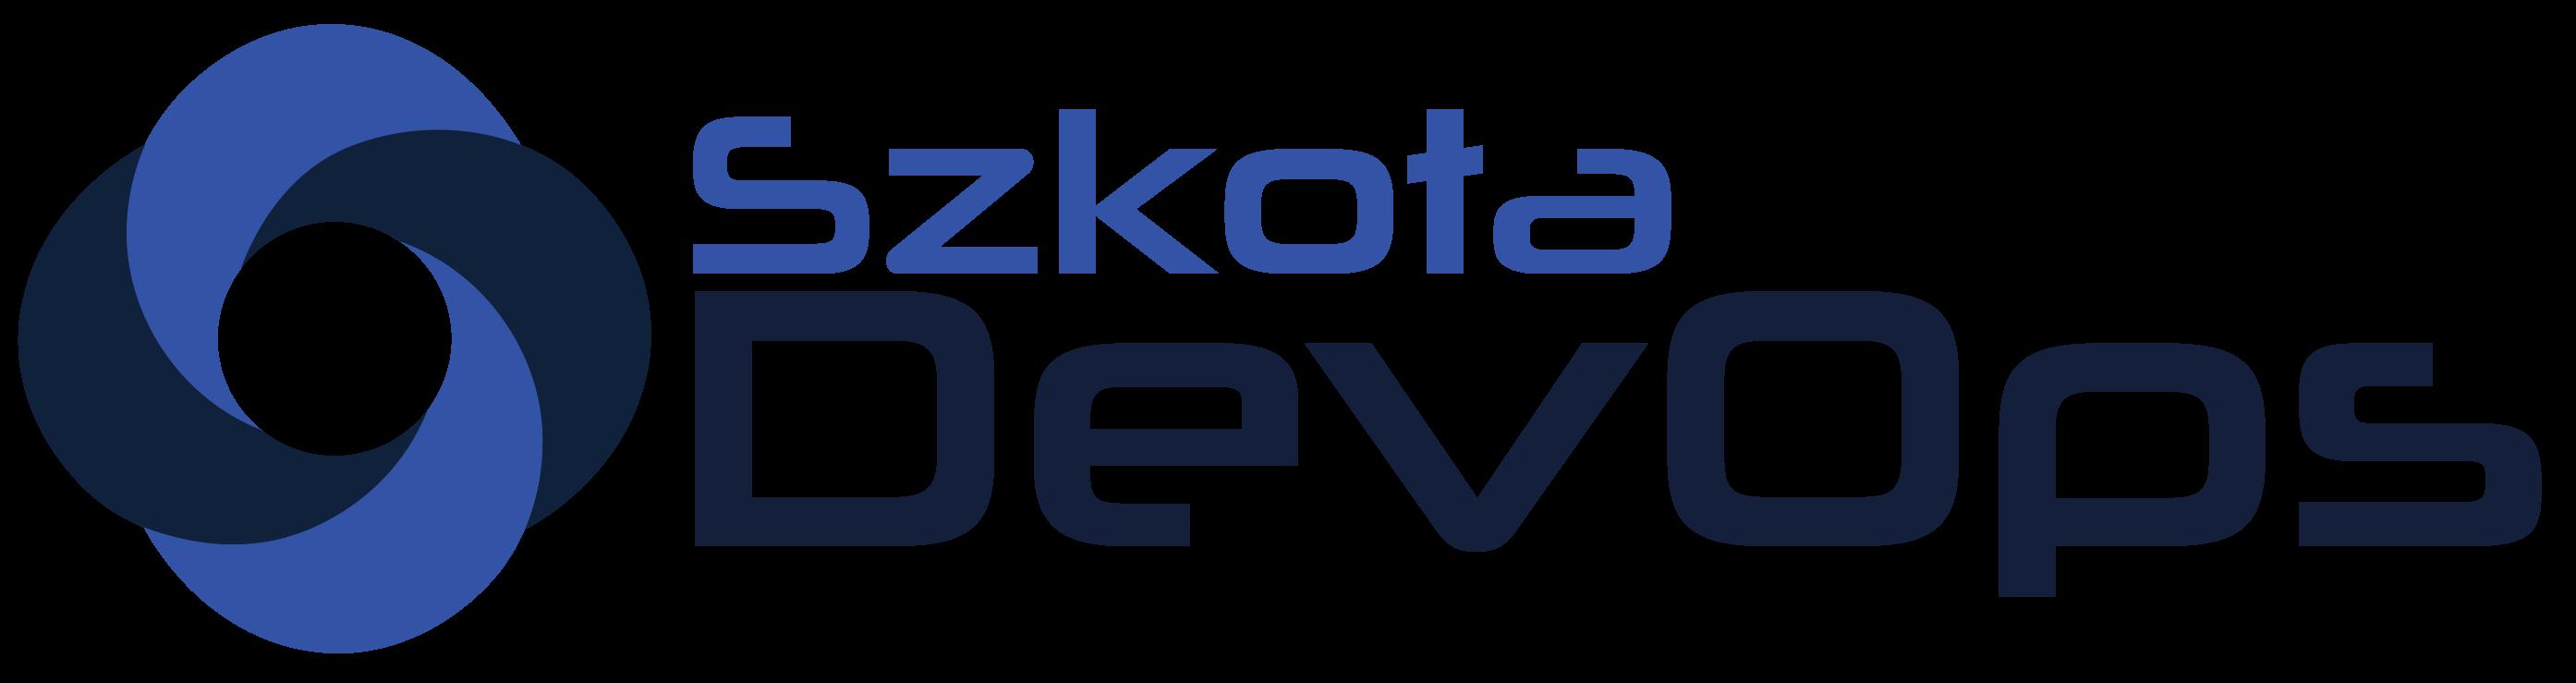 SzkolaDevOps.com